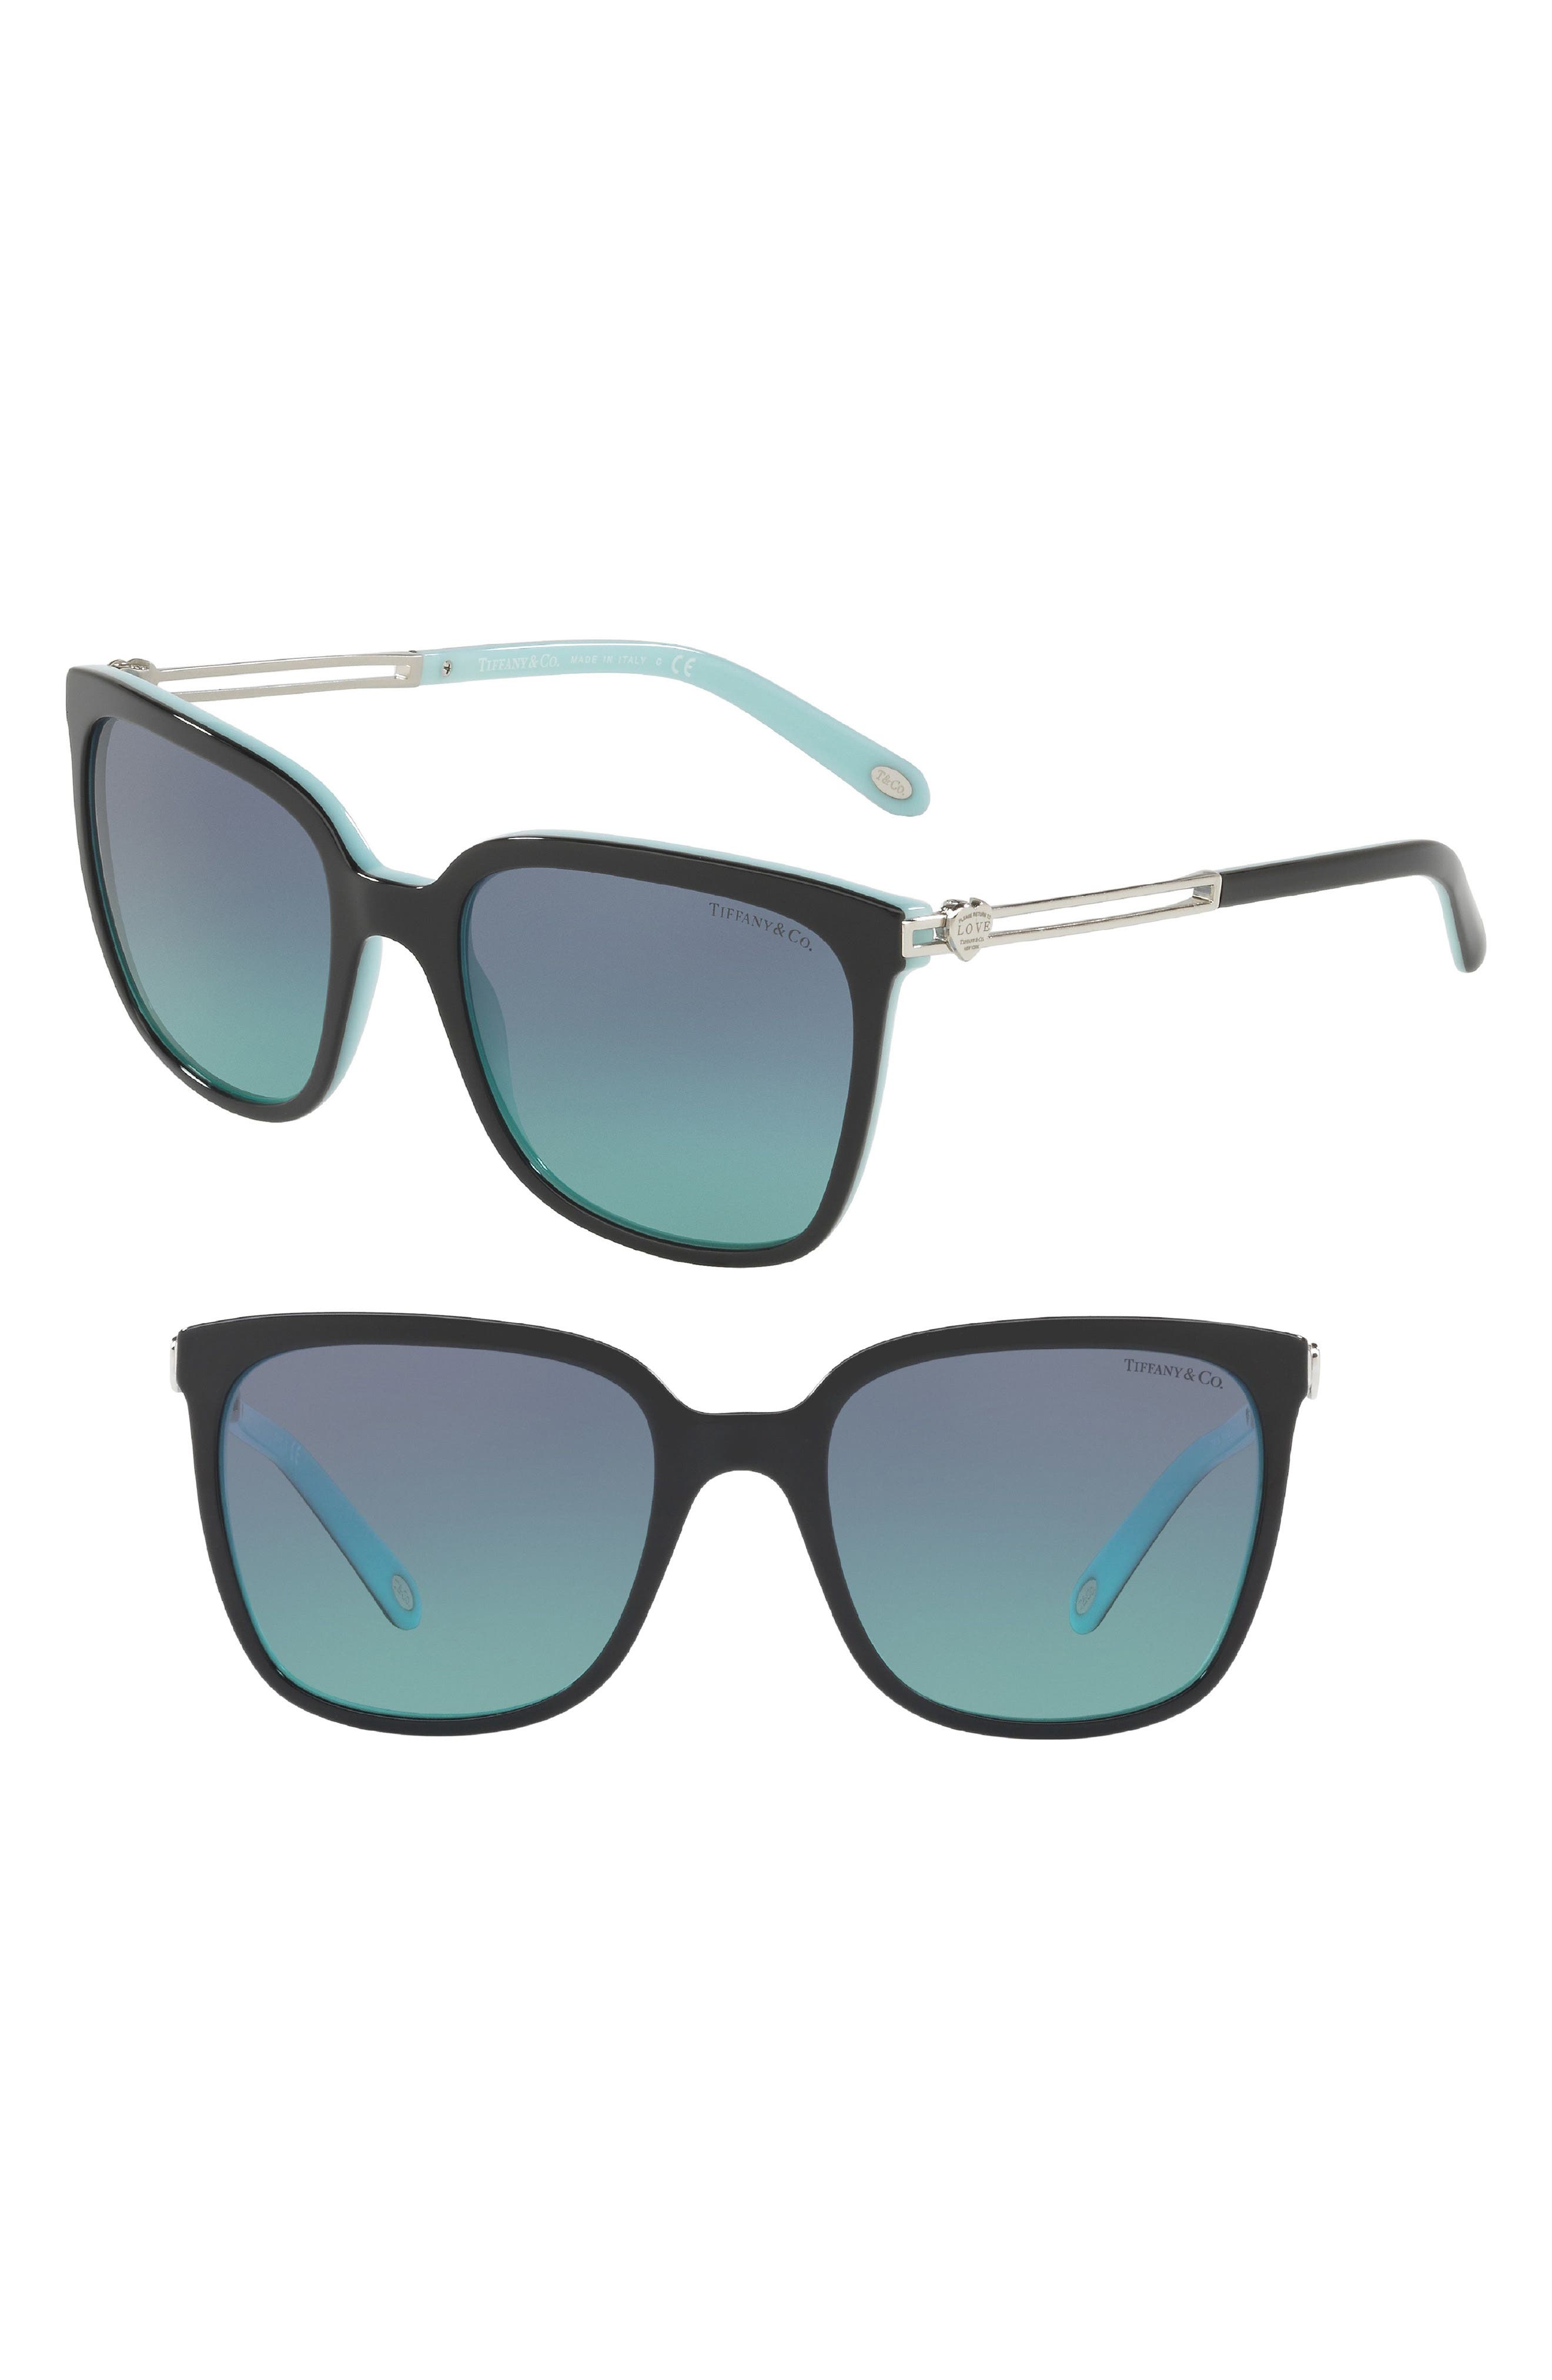 Tiffany 54mm Sunglasses,                         Main,                         color, BLACK/ BLUE GRADIENT